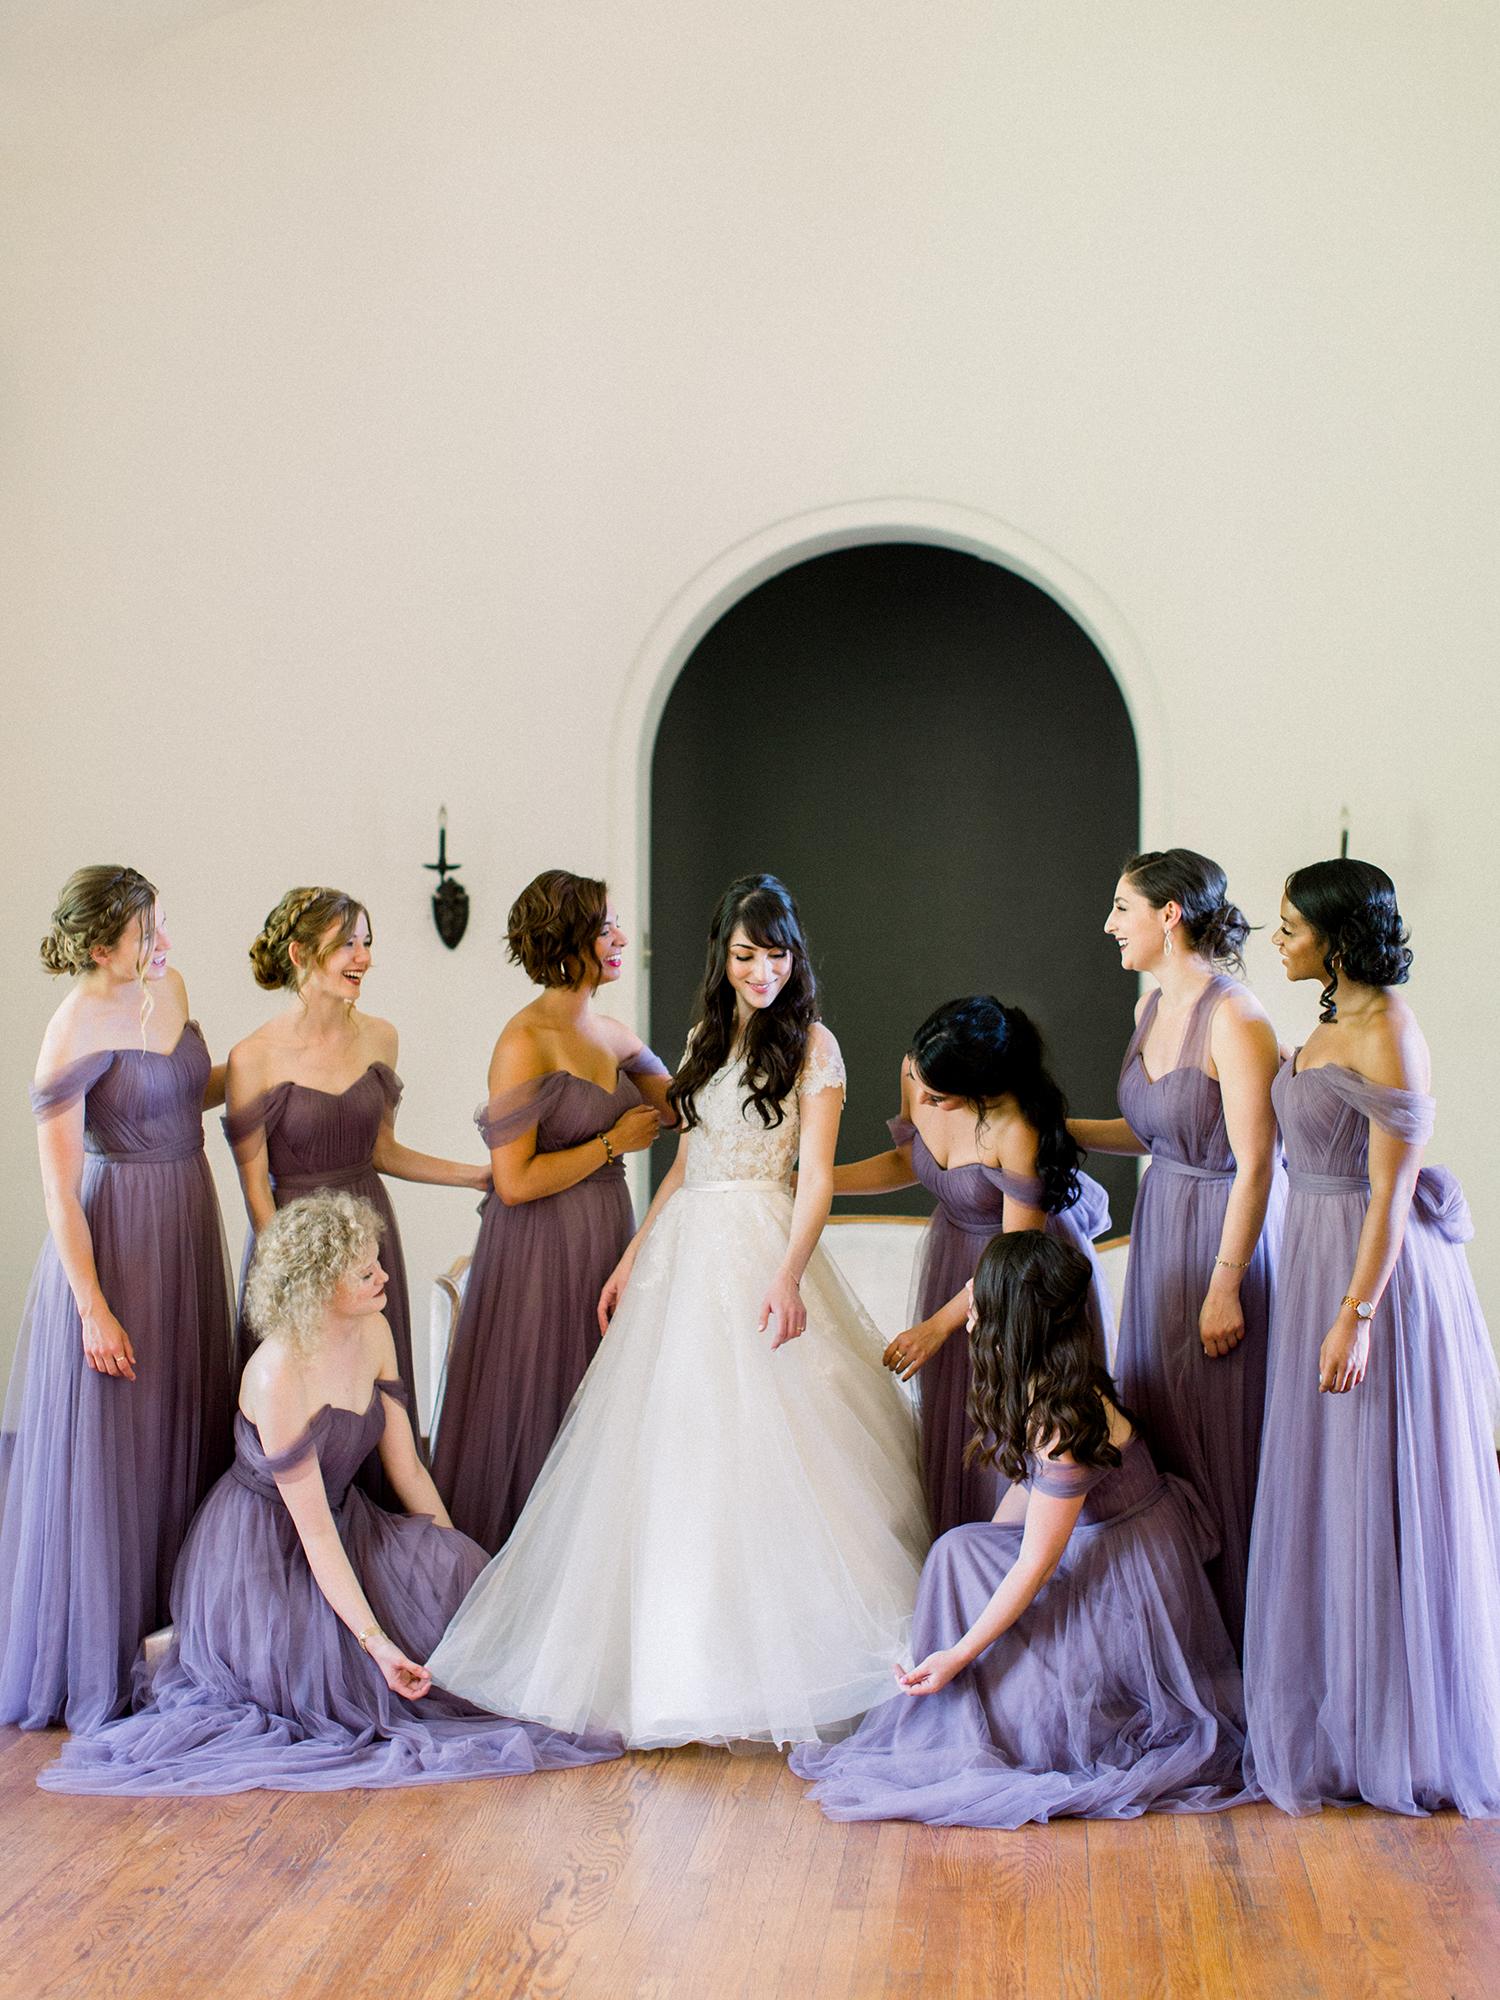 molly josh wedding bridesmaids in purple dresses